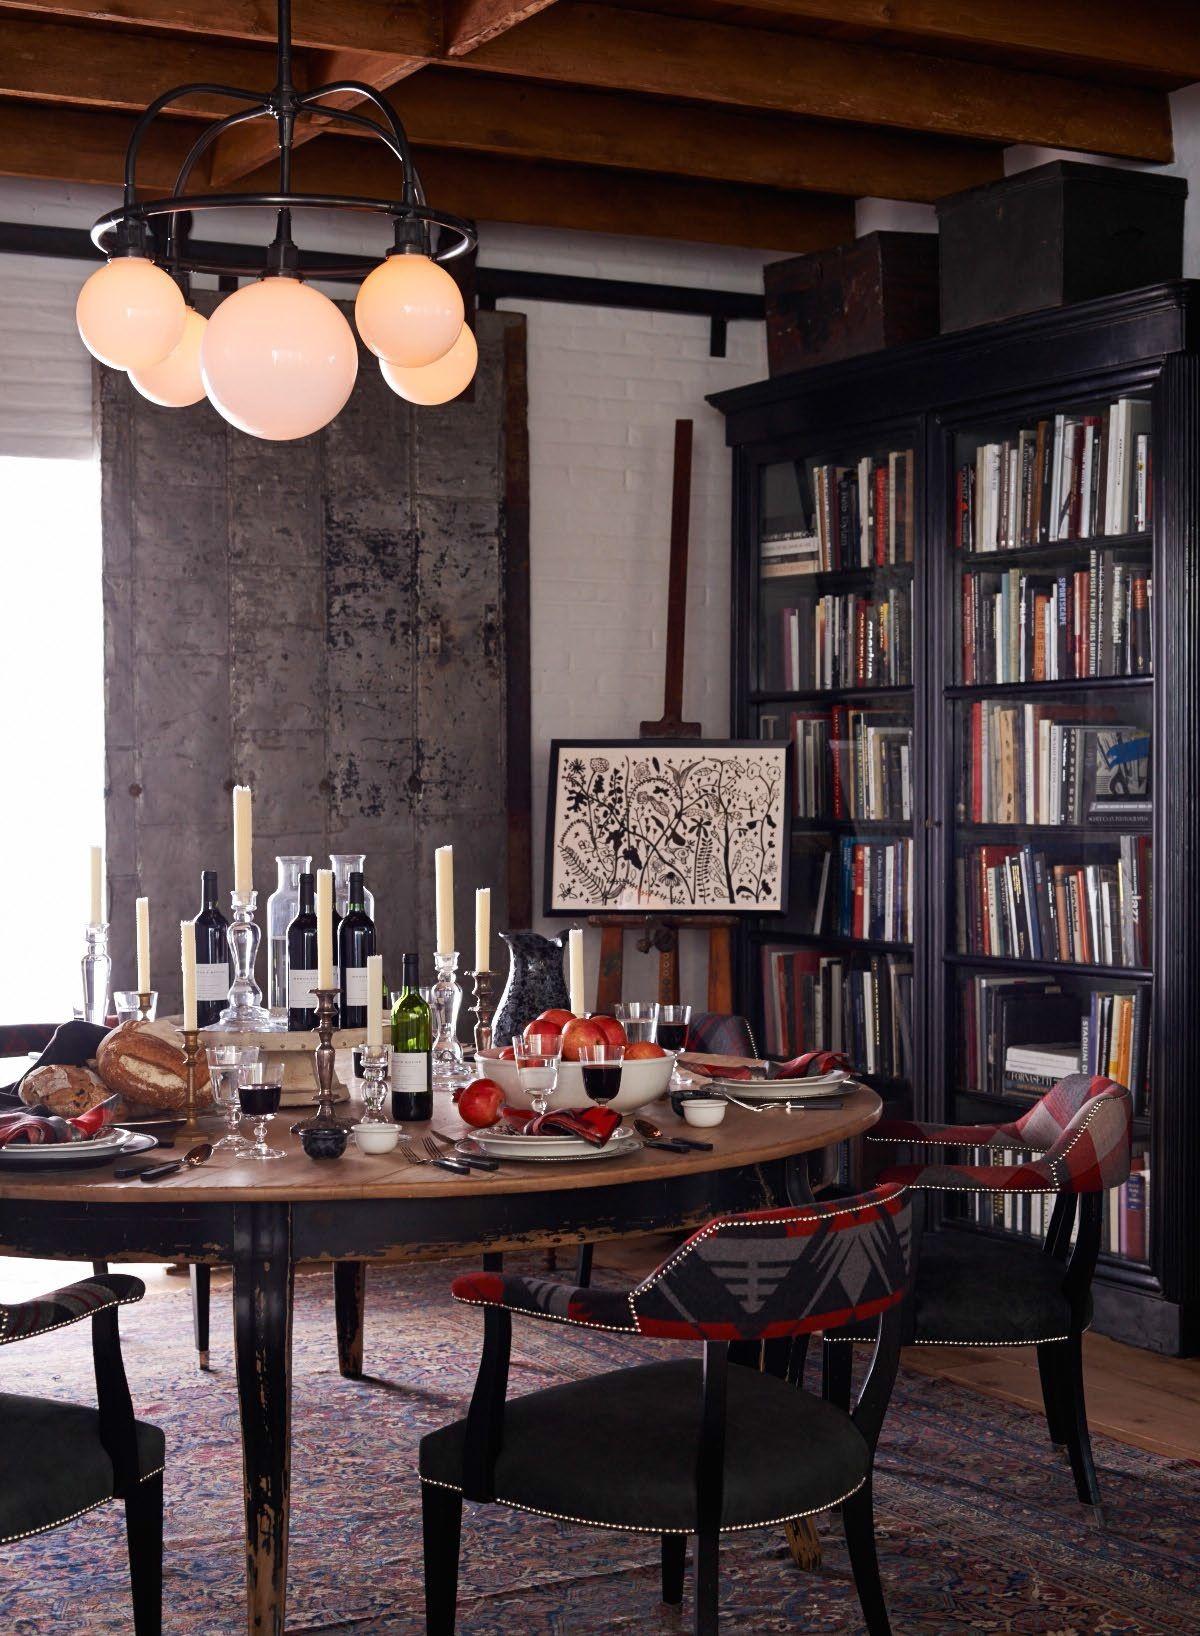 Inspired dining moment from Ralph Lauren Homeu0027s